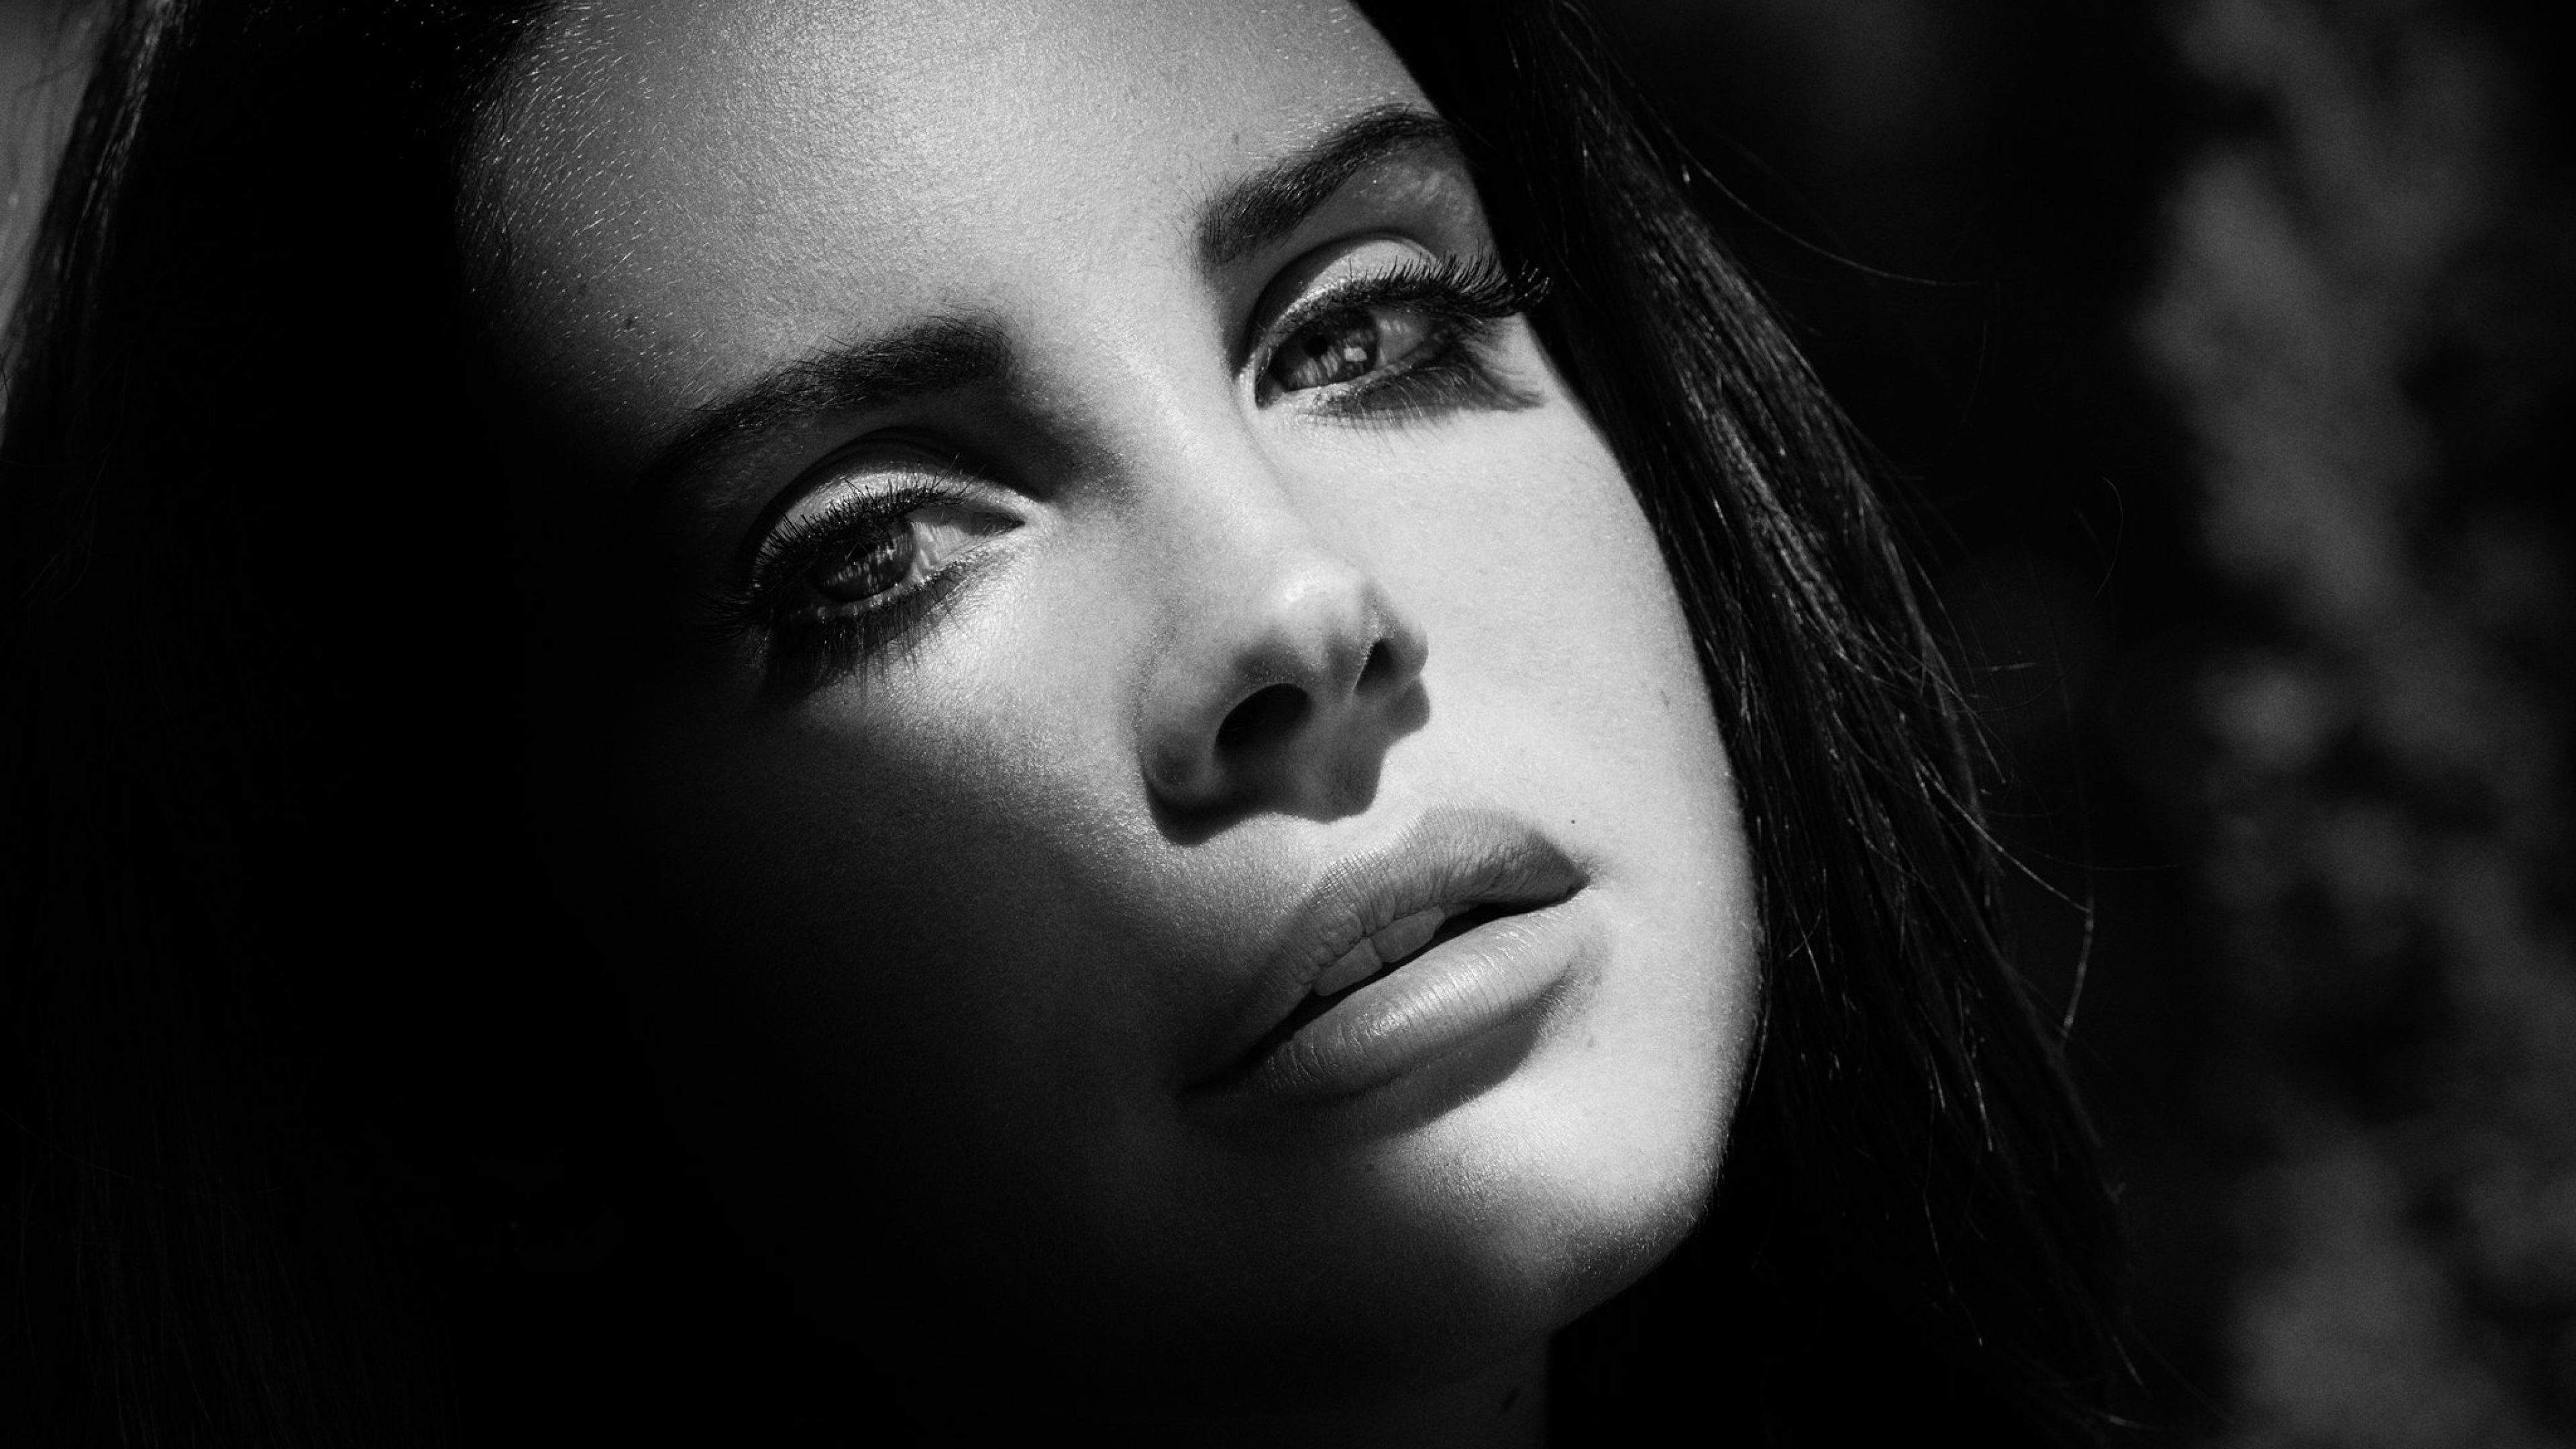 Lana Del Rey Wallpaper 22   3840 X 2160 stmednet 3840x2160